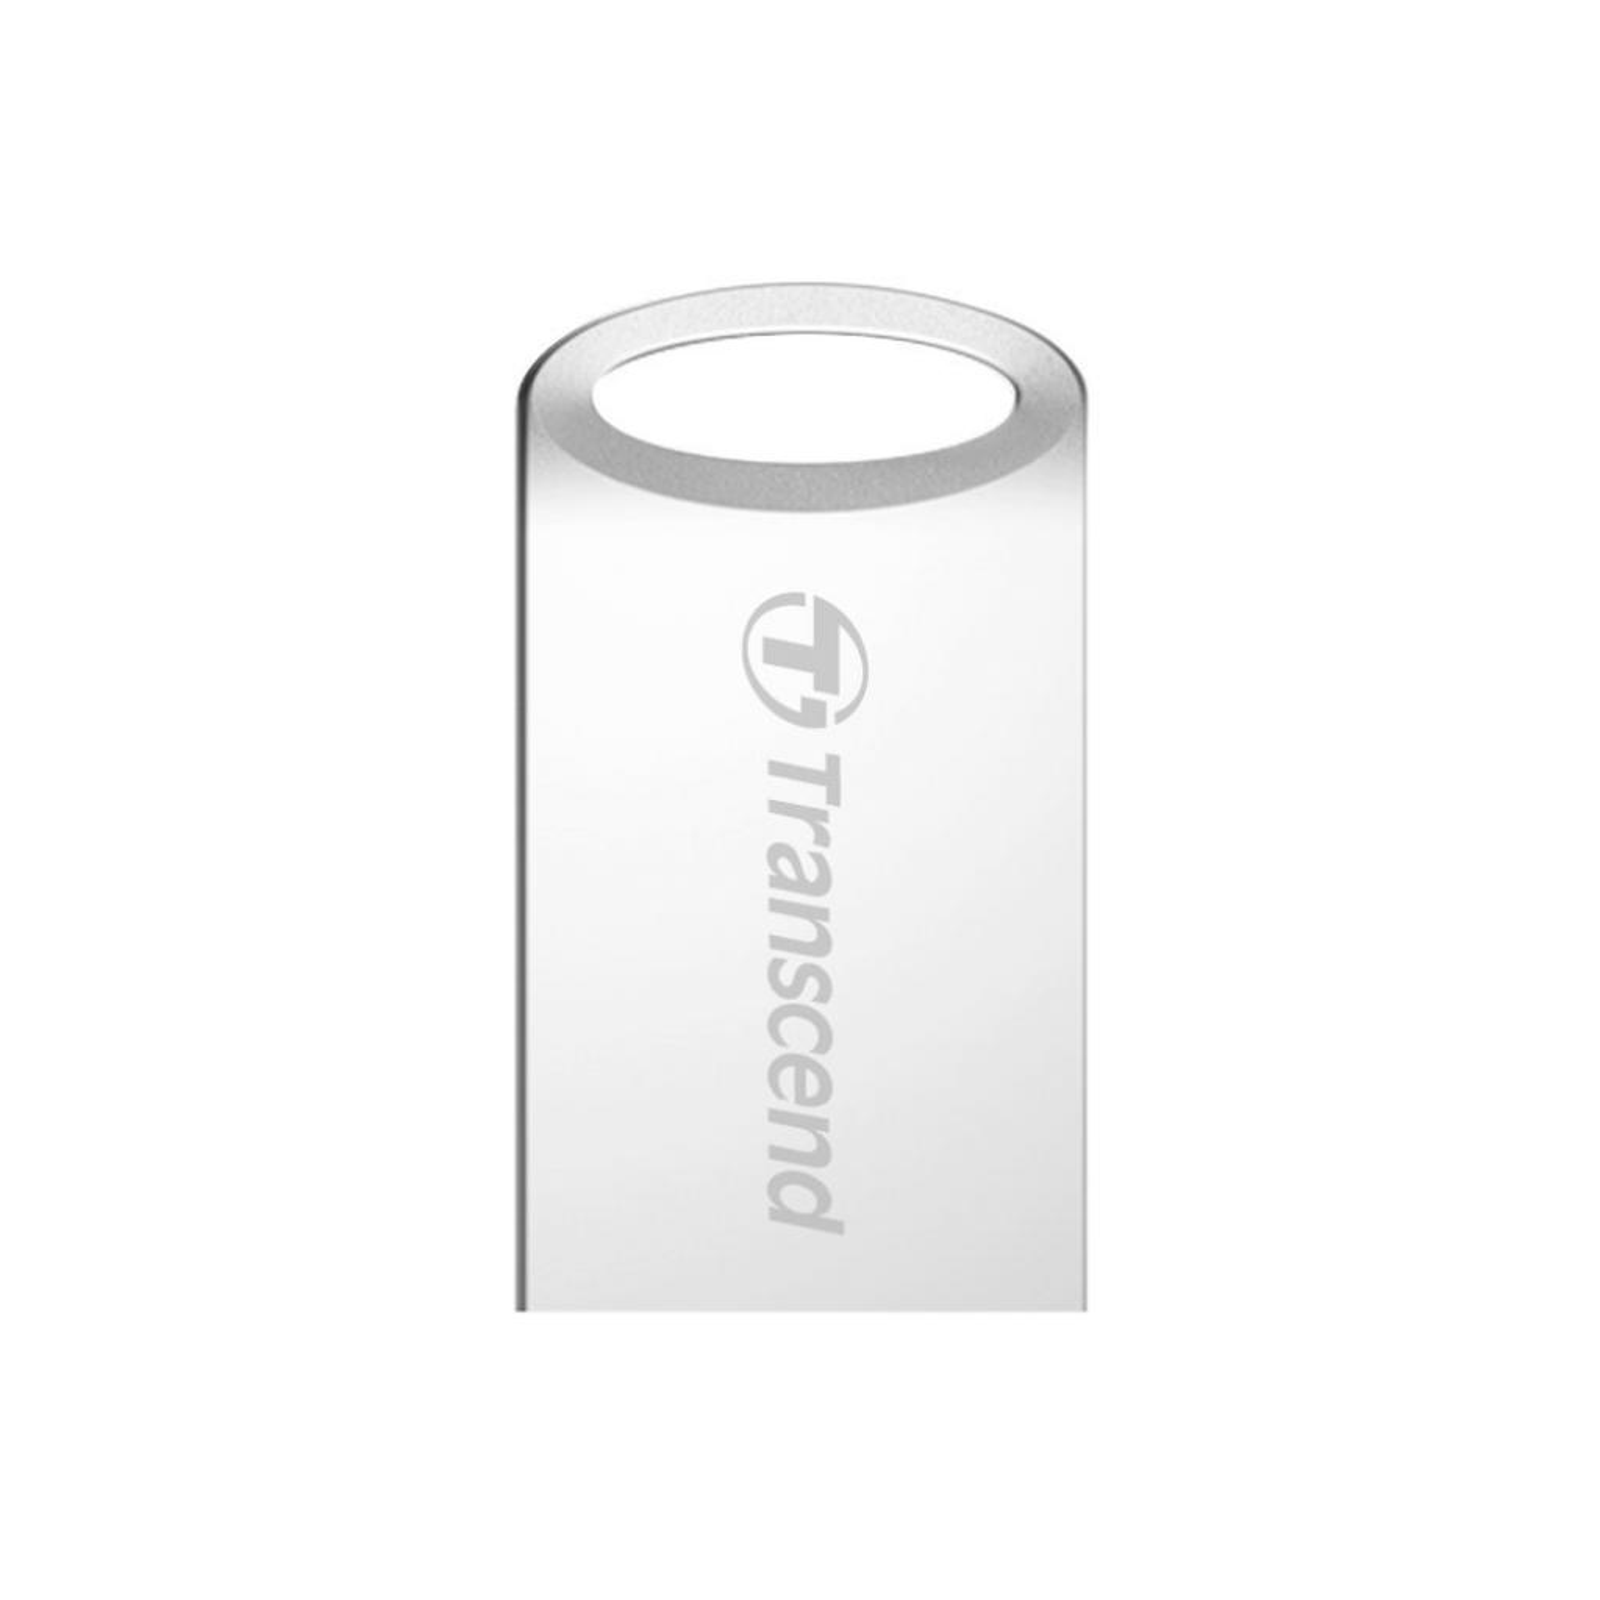 USB флеш накопитель Transcend JetFlash 510, Silver Plating (TS32GJF510S)